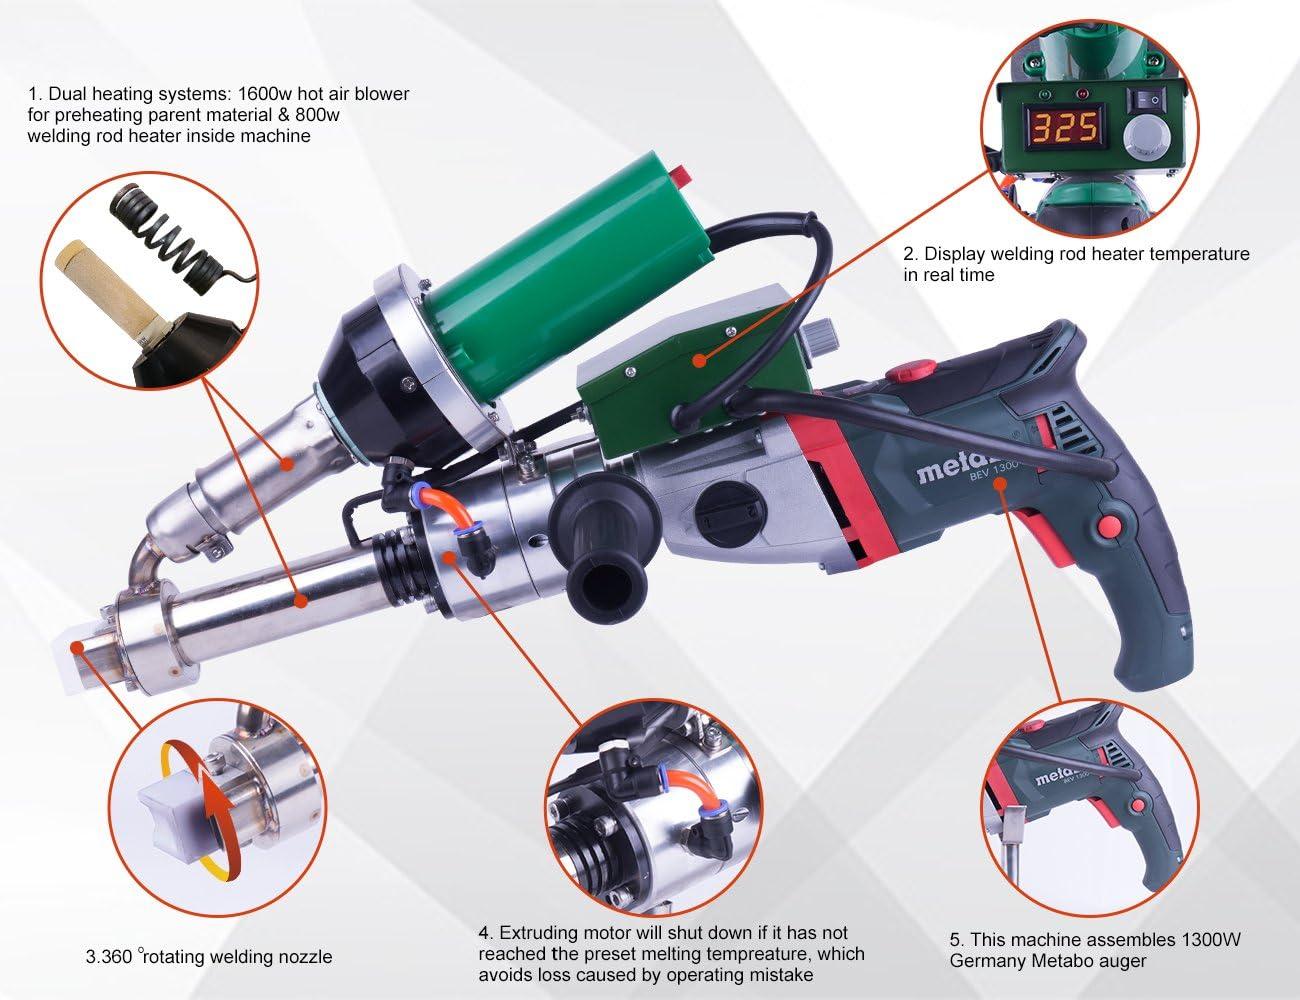 LESITE Handheld Plastic Extrusion Welder Kit for Fabrication ...